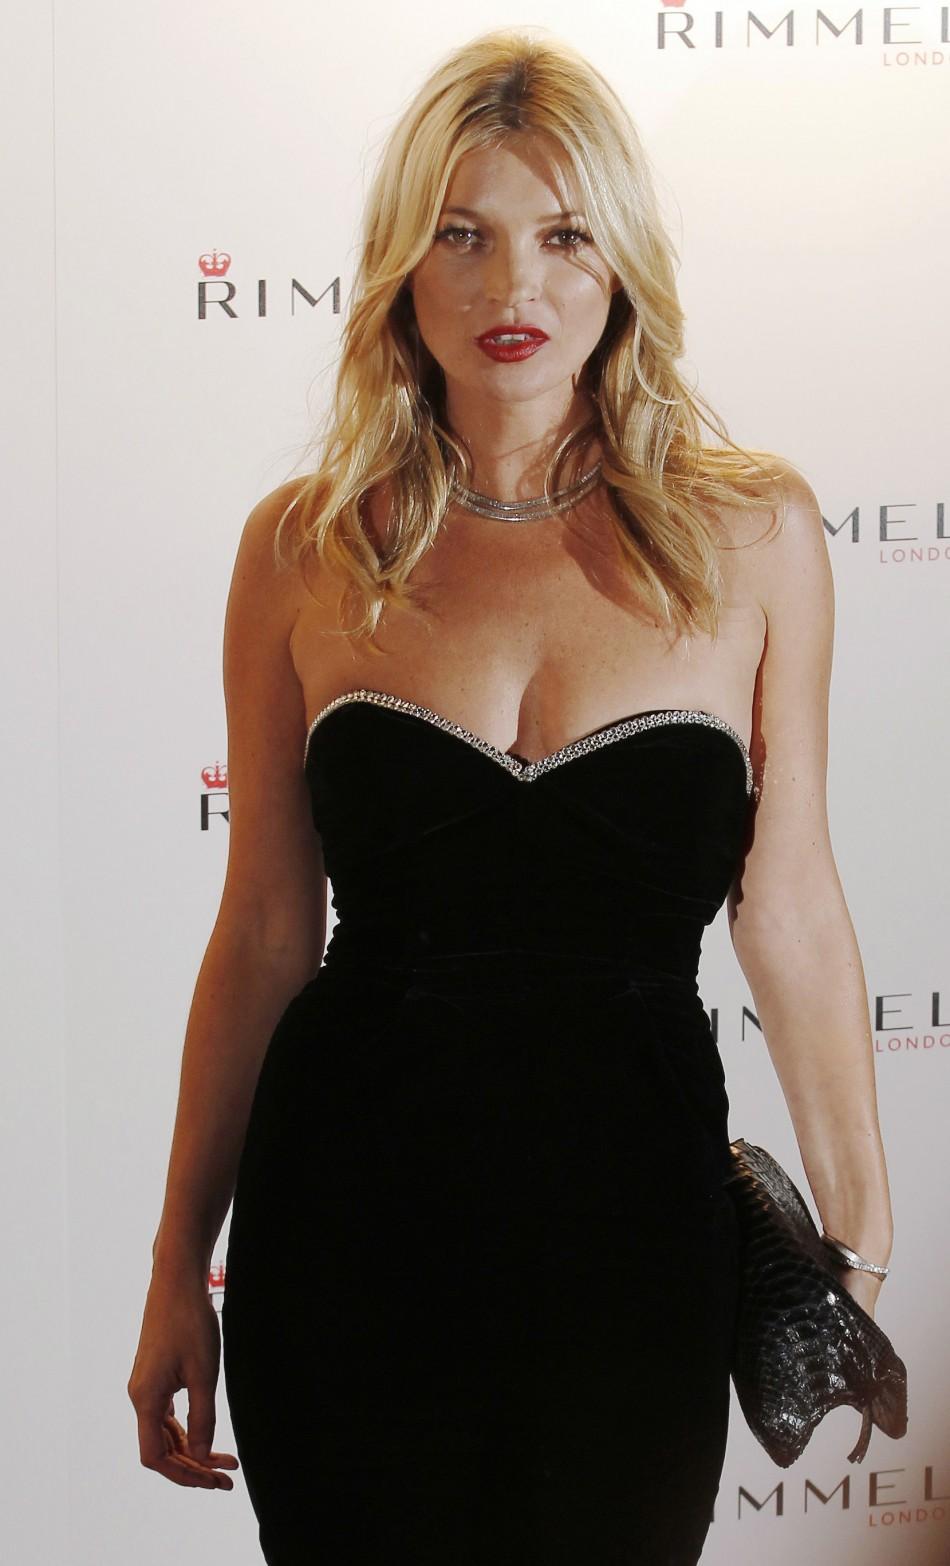 2:Kate Moss - $9.2 million